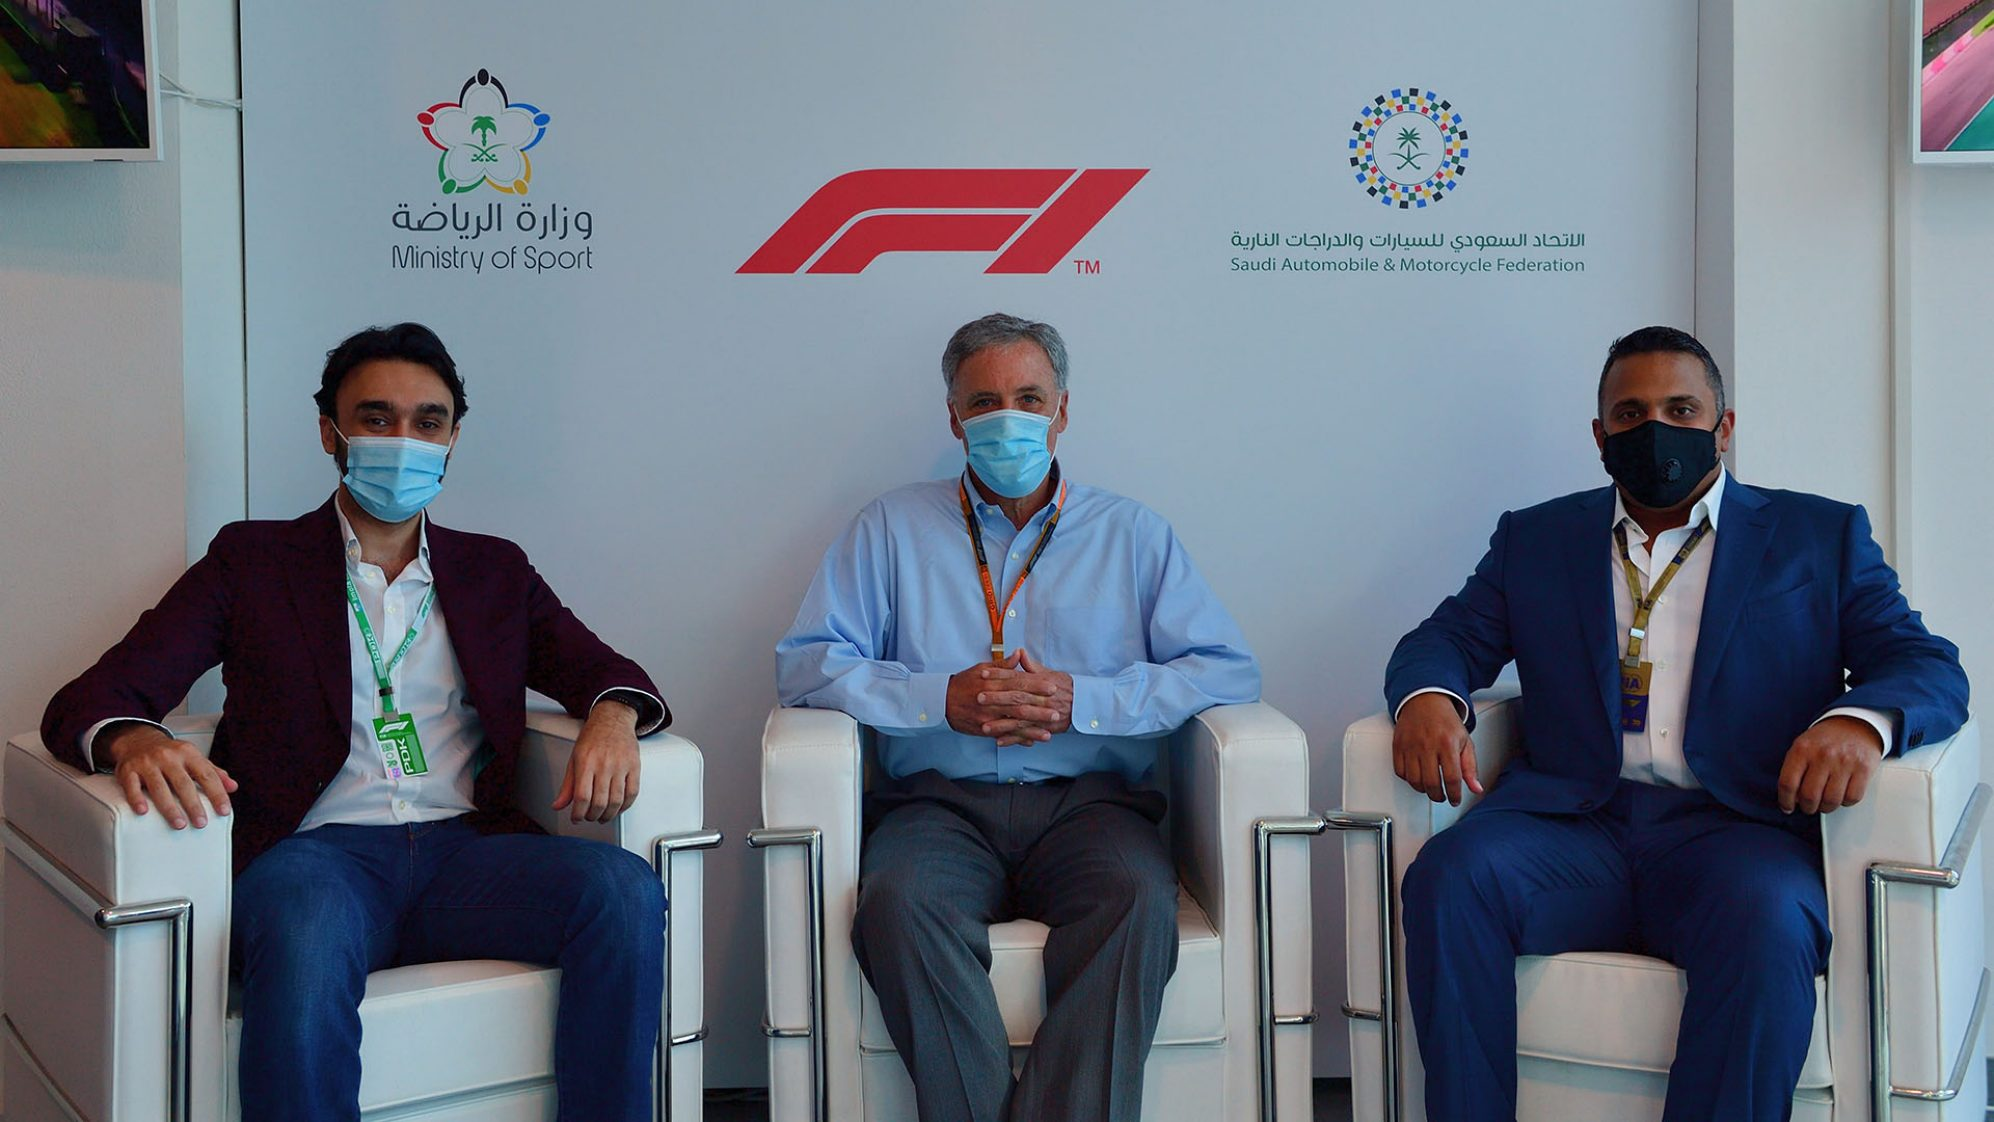 Saudi Arabia to host F1 Grand Prix